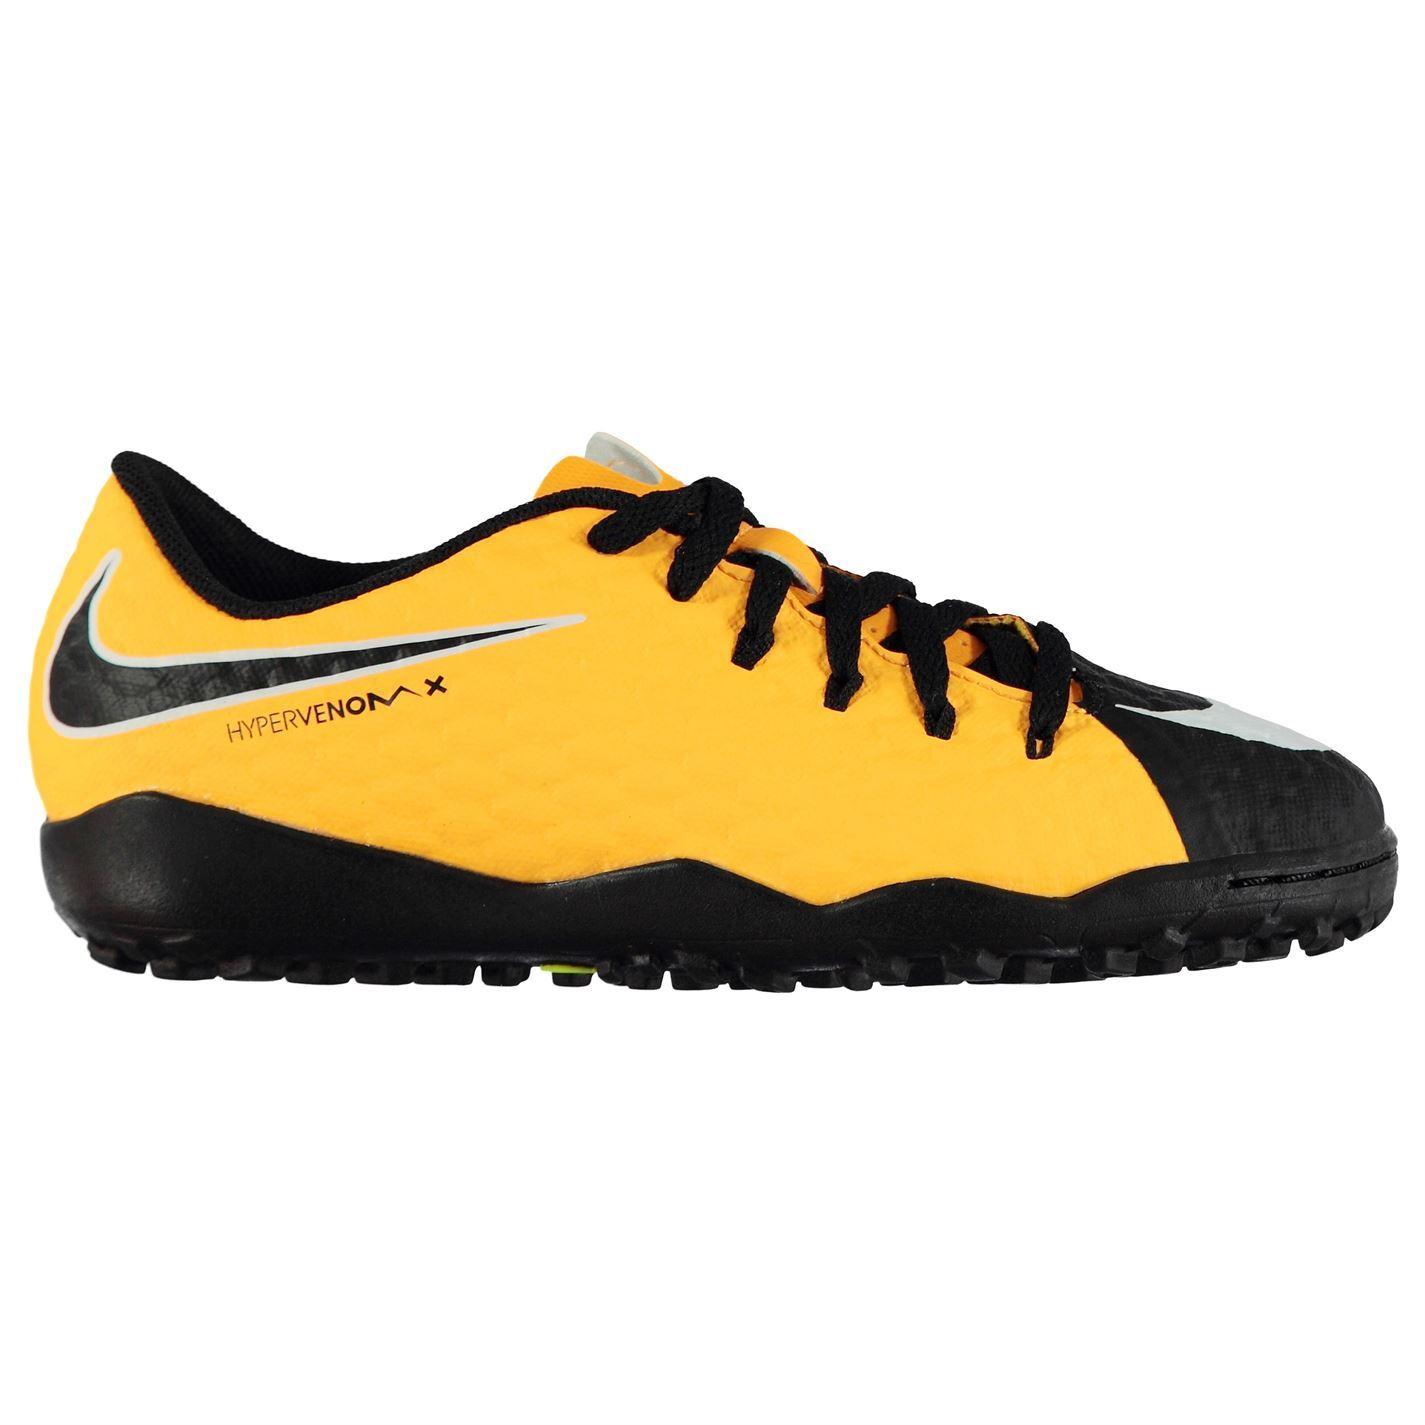 52e3c21858f9 ... Nike Hypervenom Phelon Astro Turf Football Trainers Juniors Orange  Soccer Shoes ...